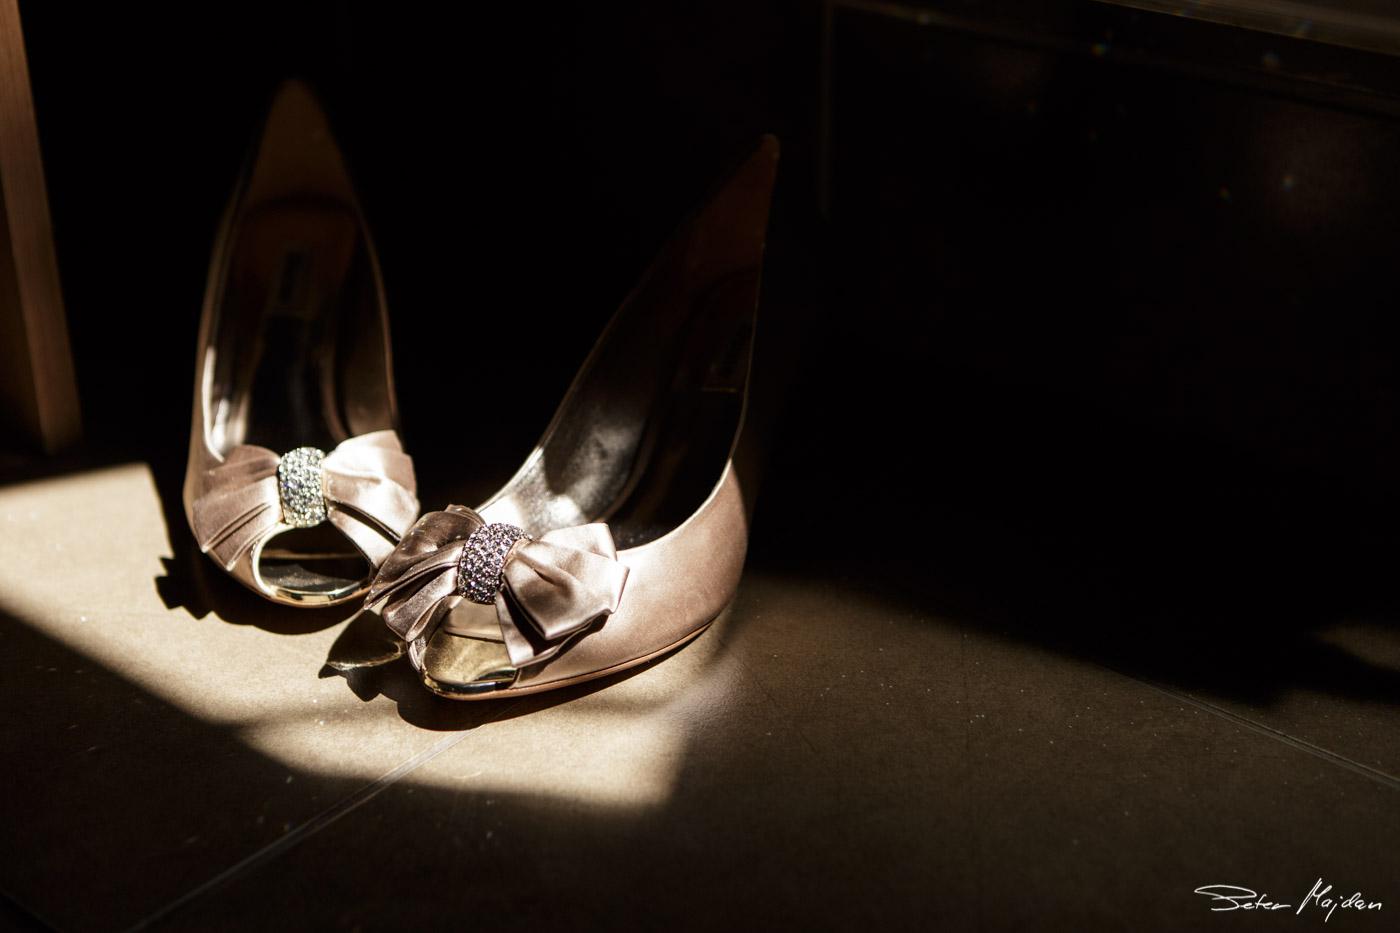 Colwick-hall-wedding-photography-8.jpg